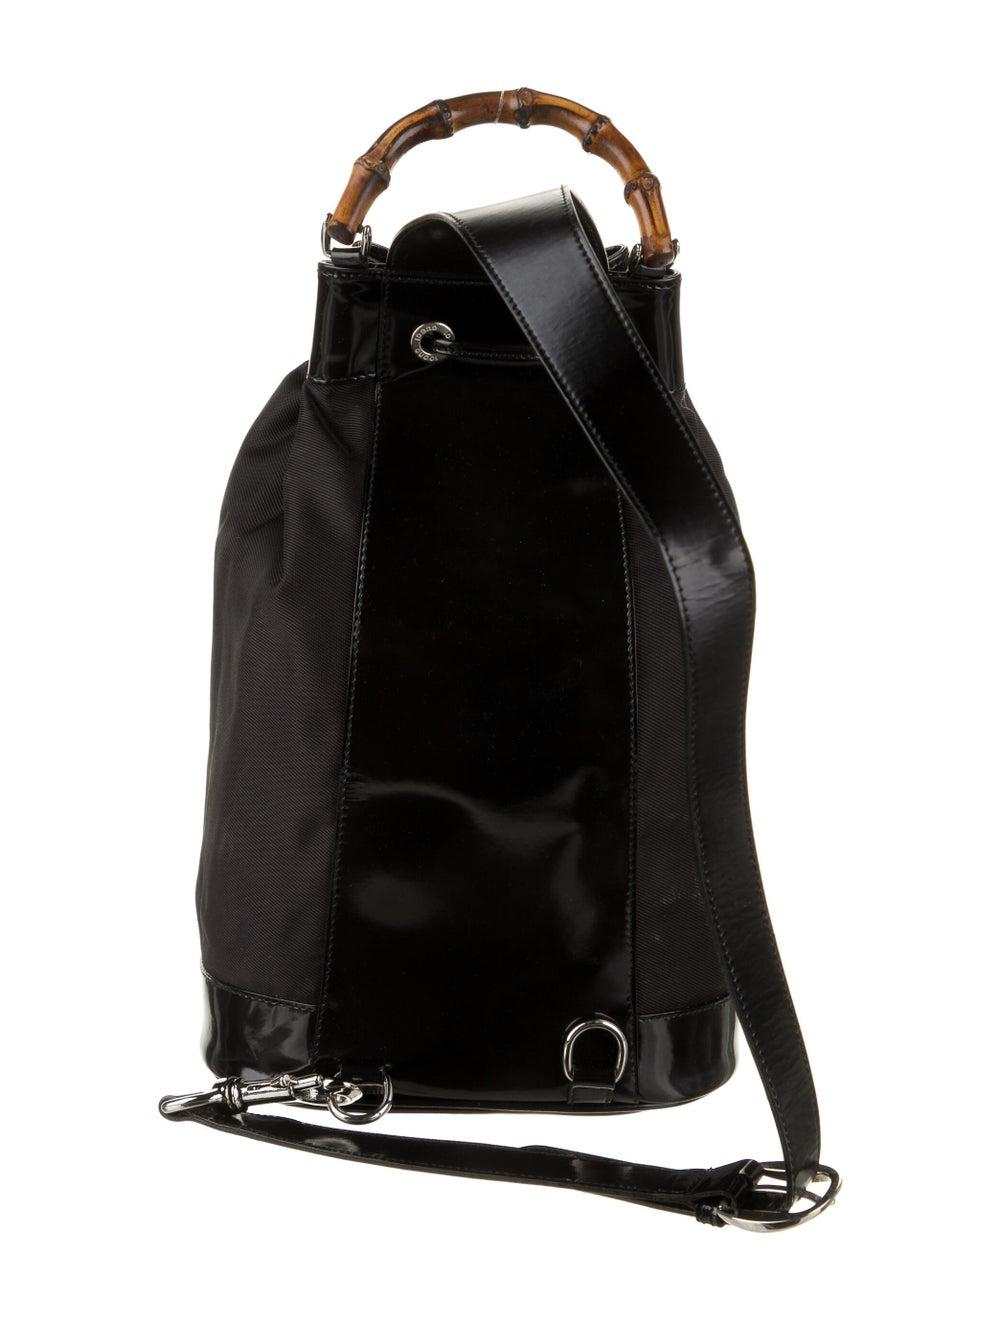 Gucci Vintage Bamboo Nylon Sling Bag Black - image 4